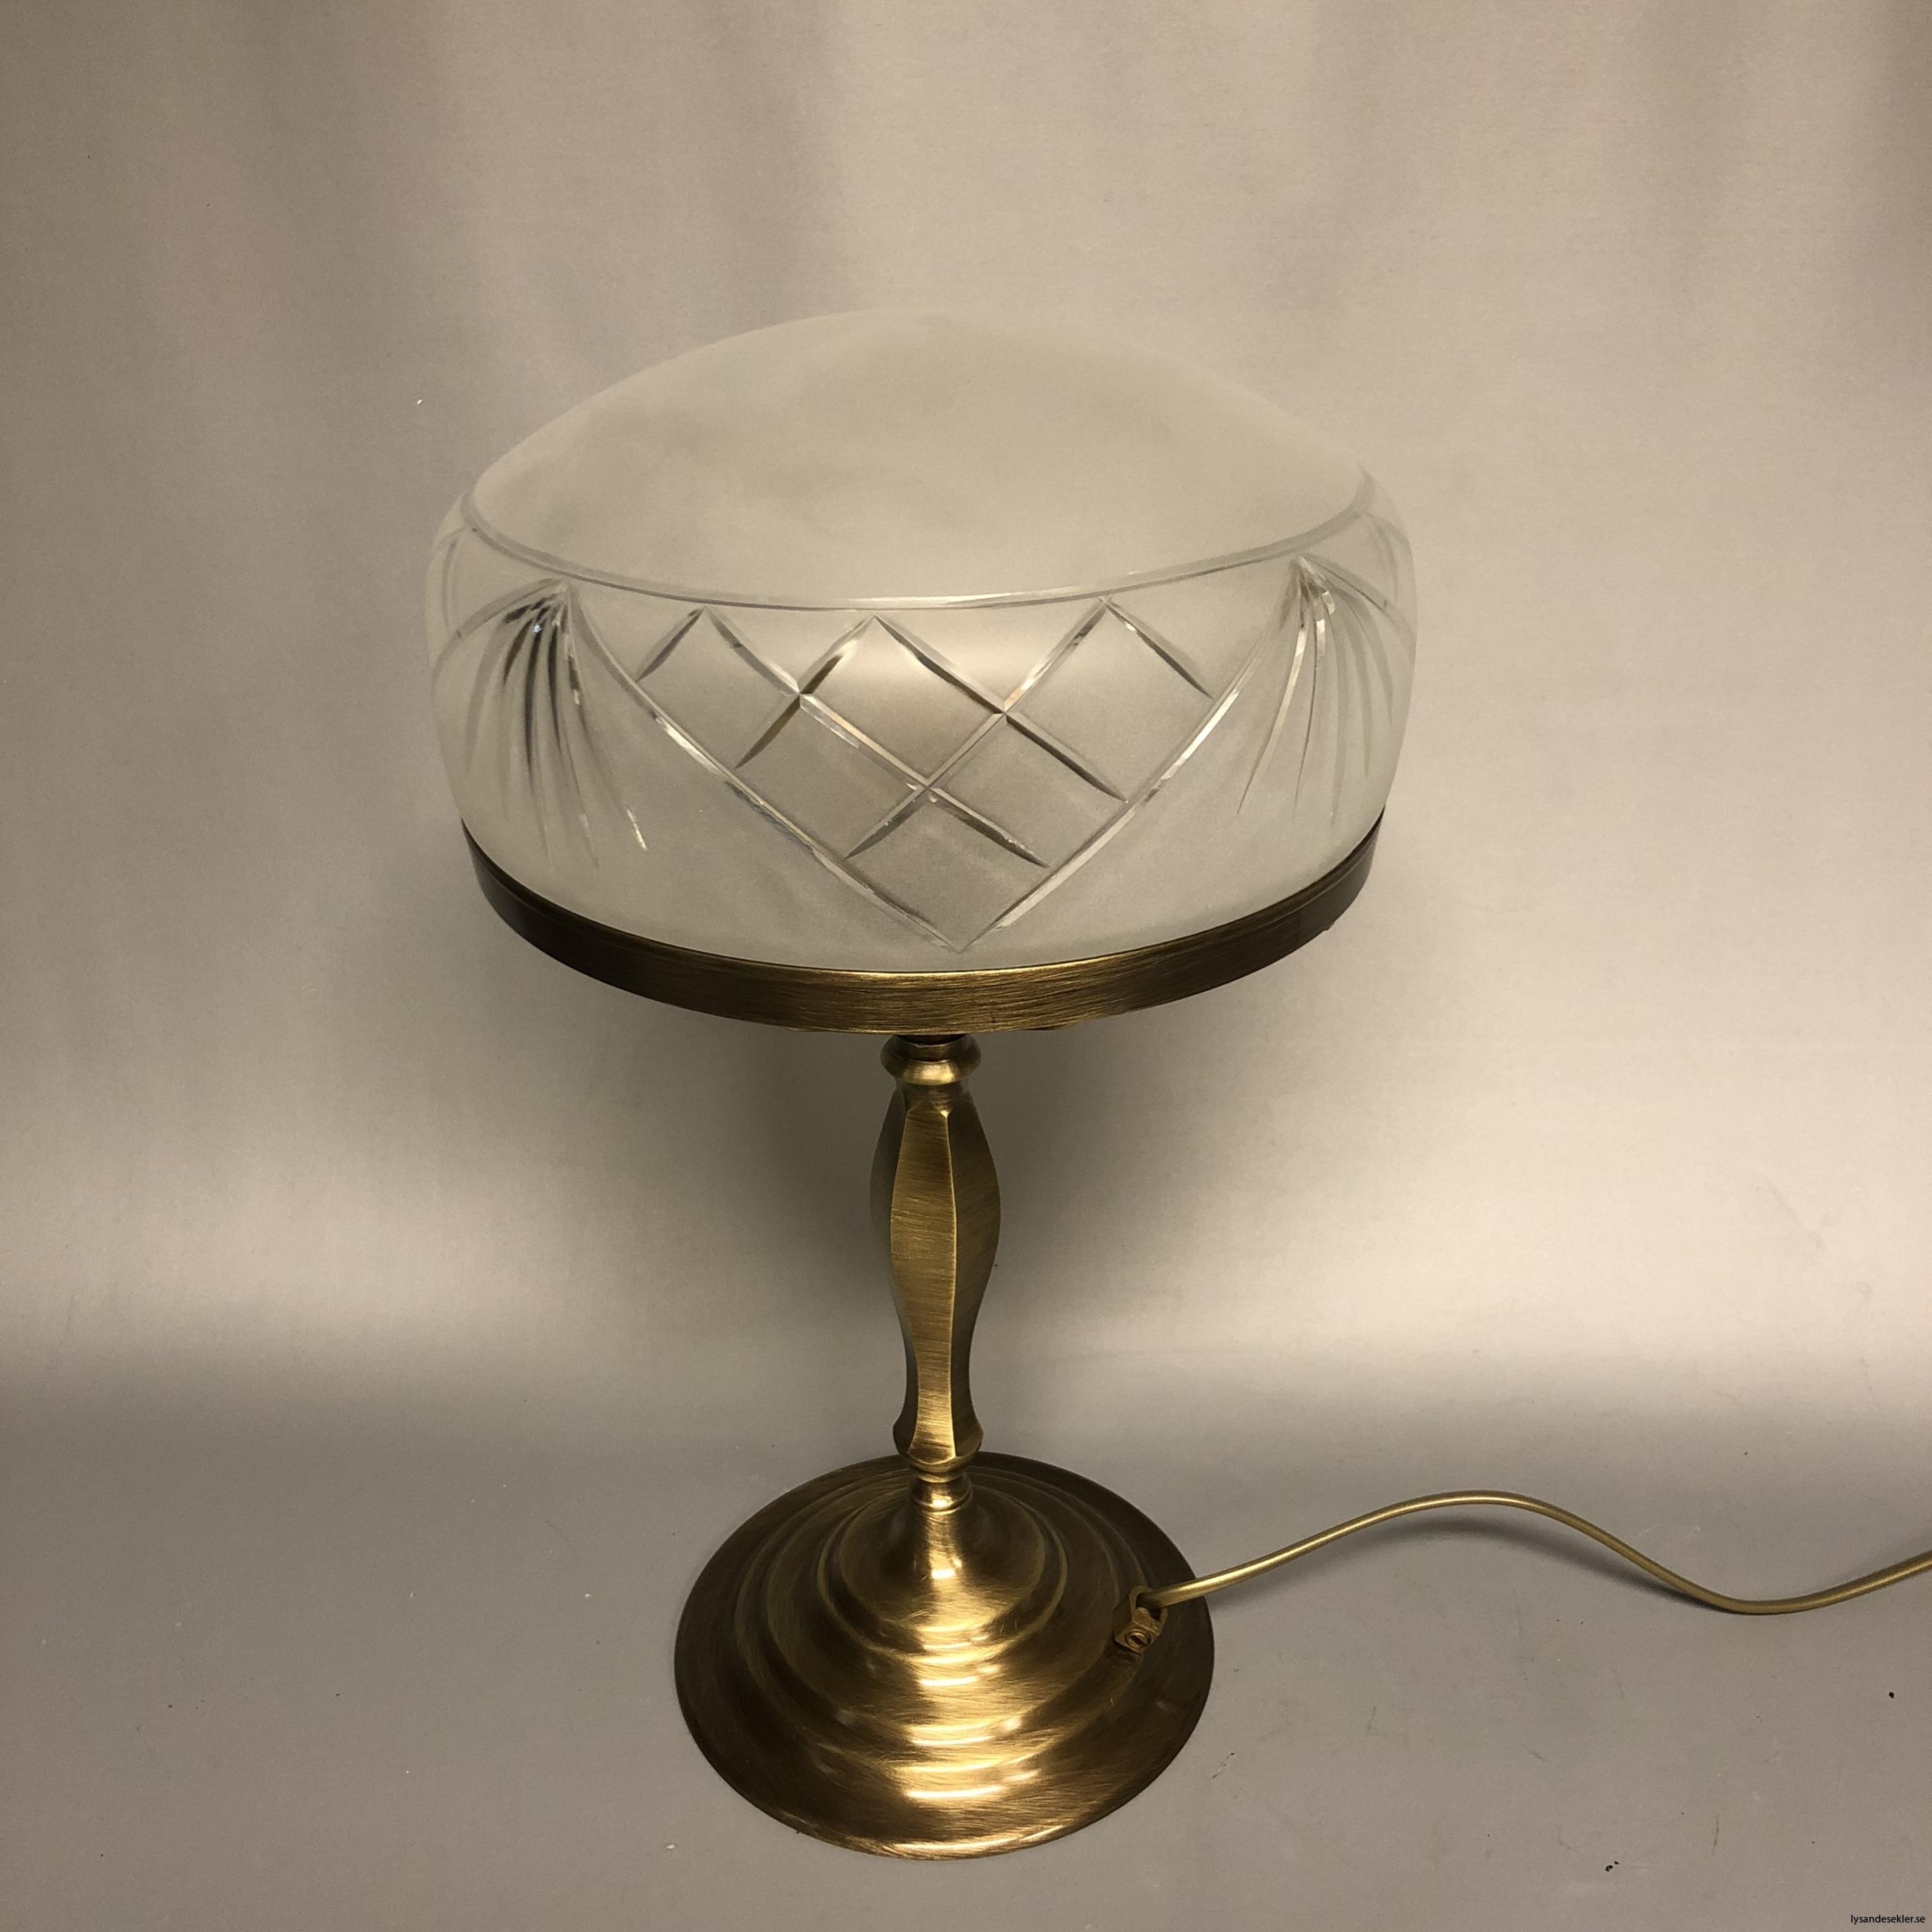 strindbergslampa strindbergslampor strindberg lampa skärm kupa strindbergsskärm strindbergskupa21